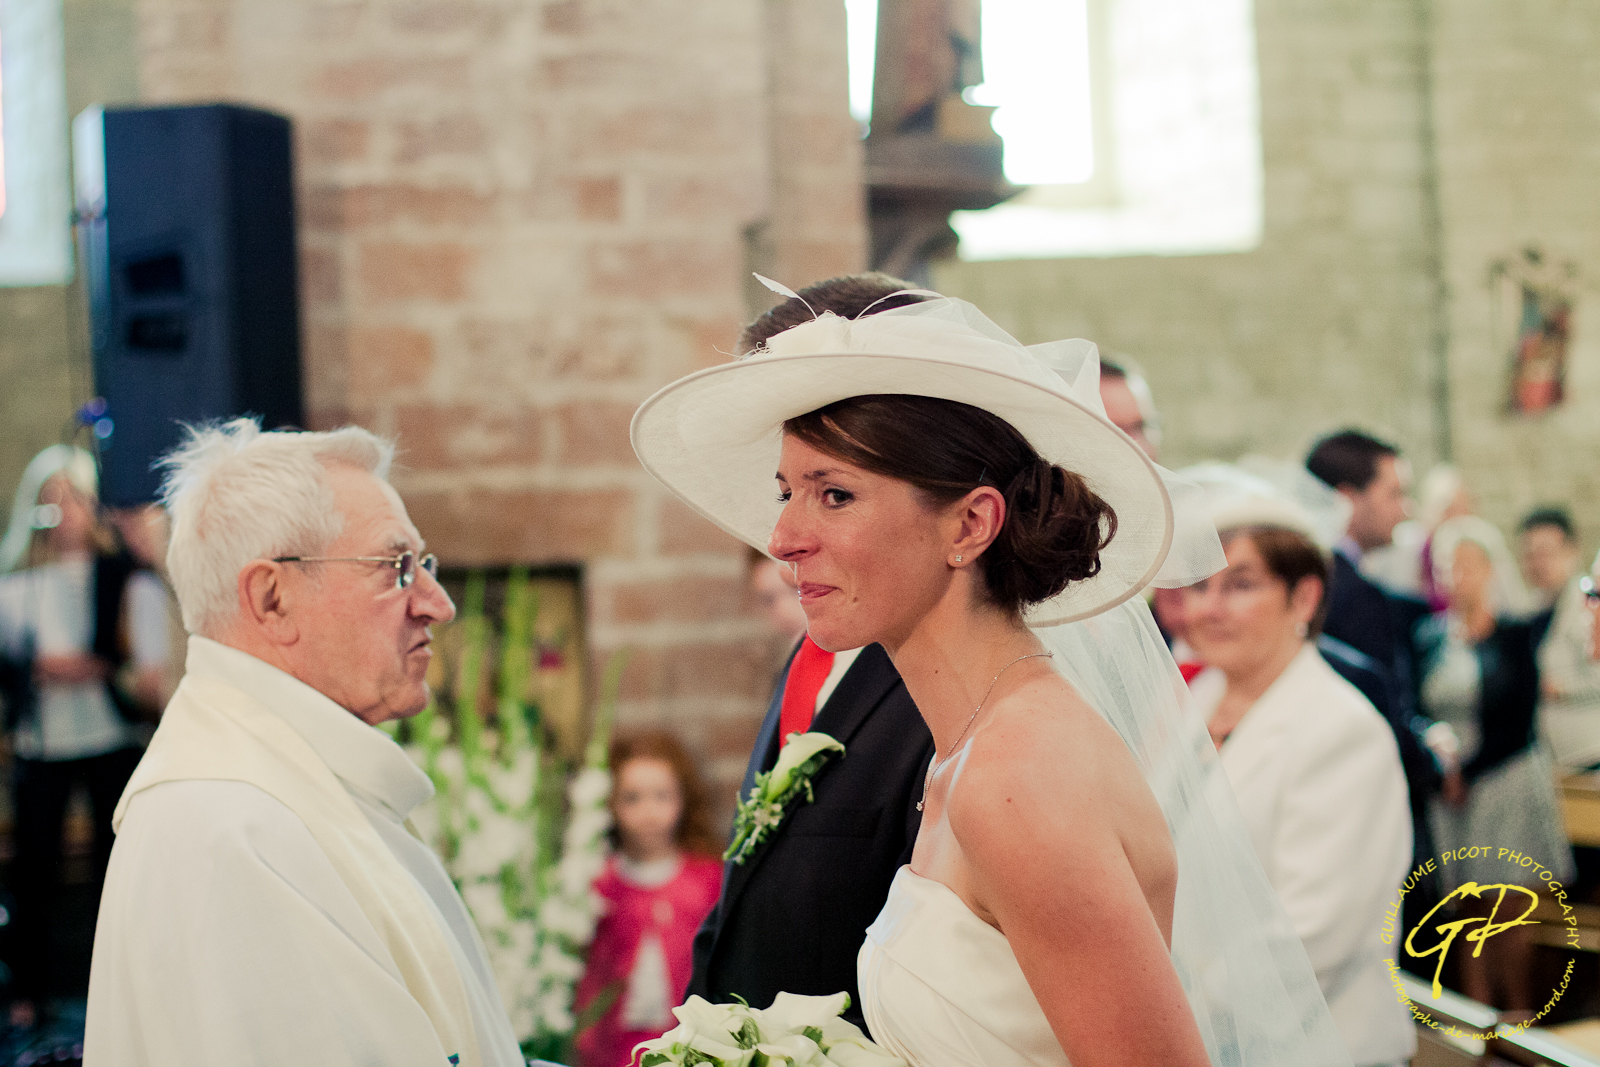 photographe mariage nord (47 sur 96)